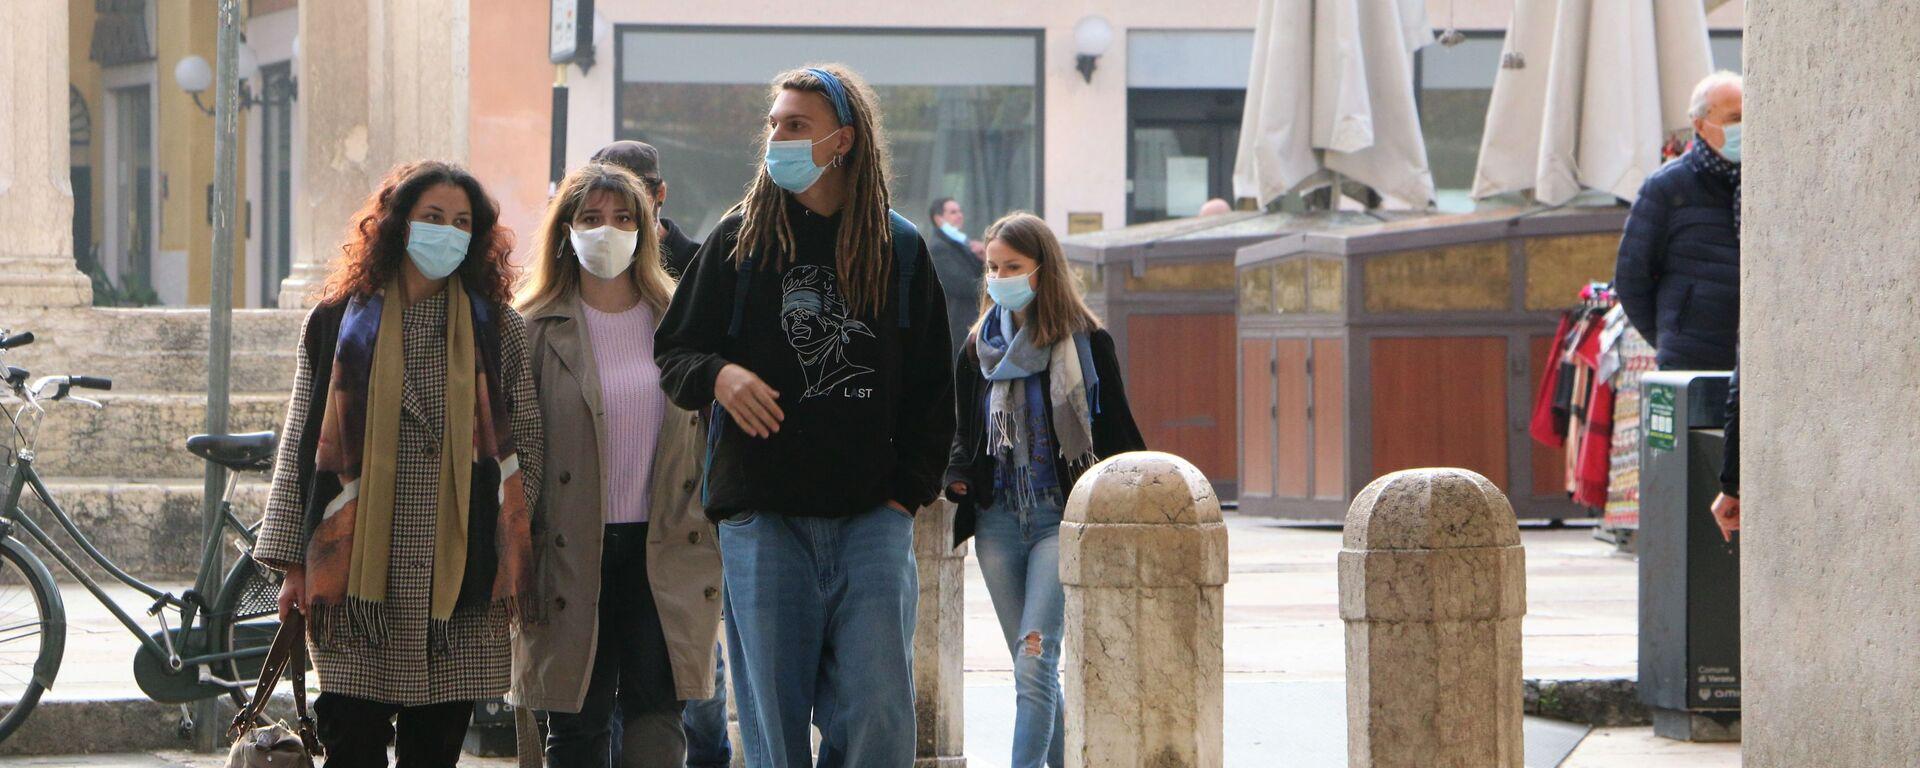 Persone indossano mascherina in Italia  - Sputnik Italia, 1920, 30.07.2021